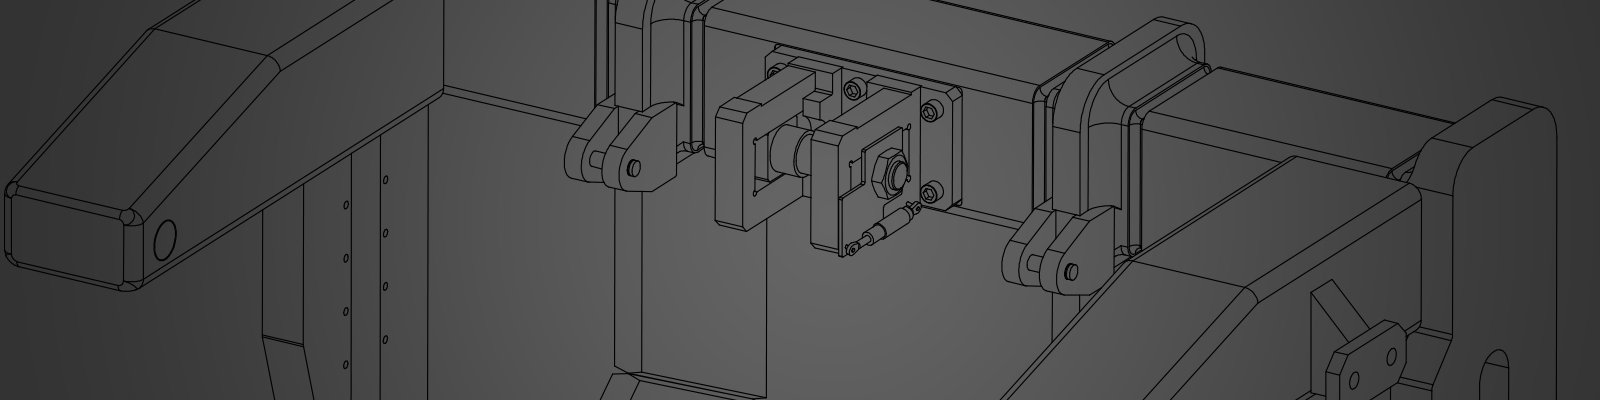 BKG-Slide-Meccanica